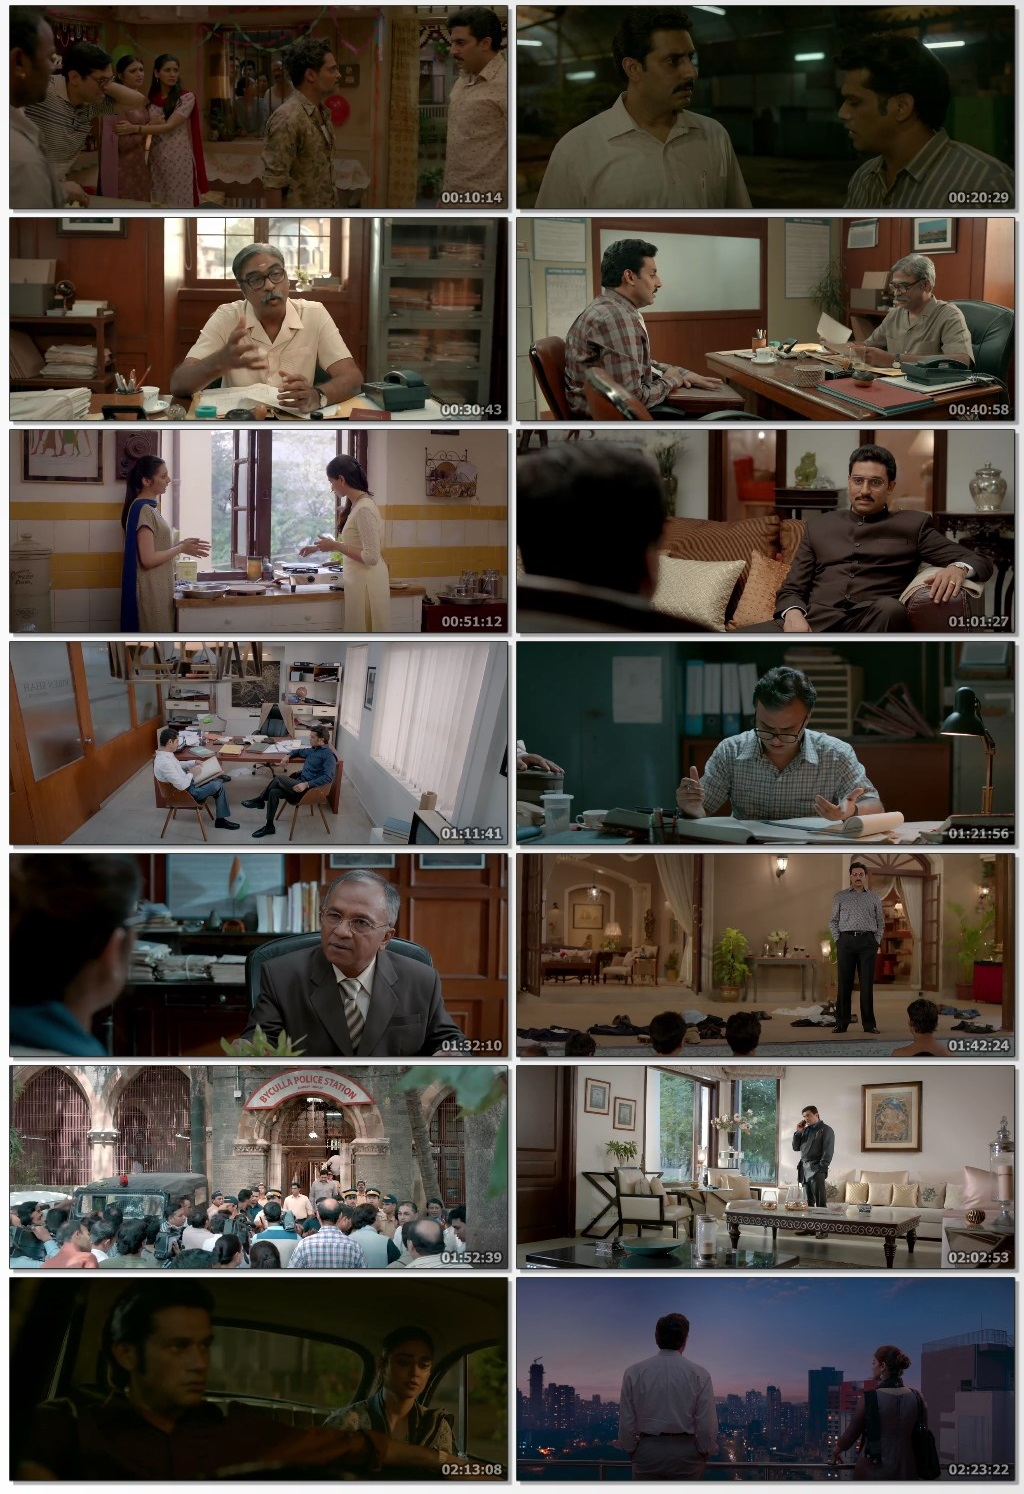 The-Big-Bull-2021-www-9kmovies-cool-Hindi-Movie-720p-DSNP-HDRip-ESubs-1-GB-mkv-thumbs